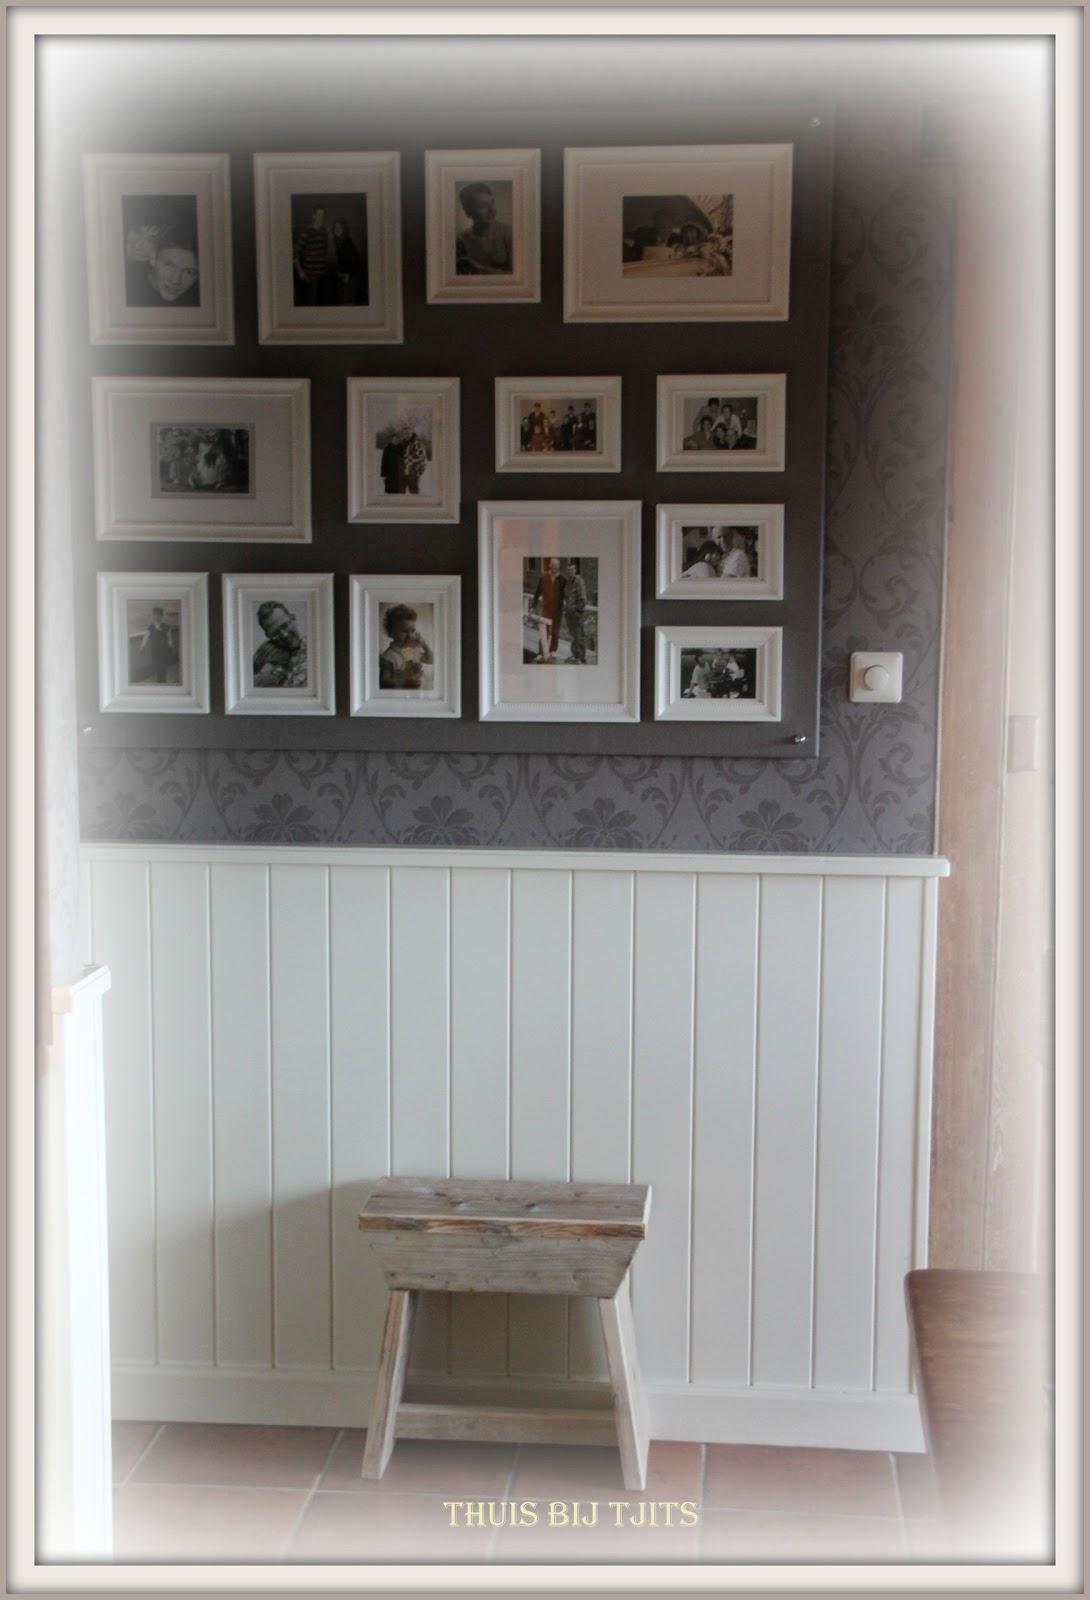 thuis bij tjits nieuwe fotowand. Black Bedroom Furniture Sets. Home Design Ideas